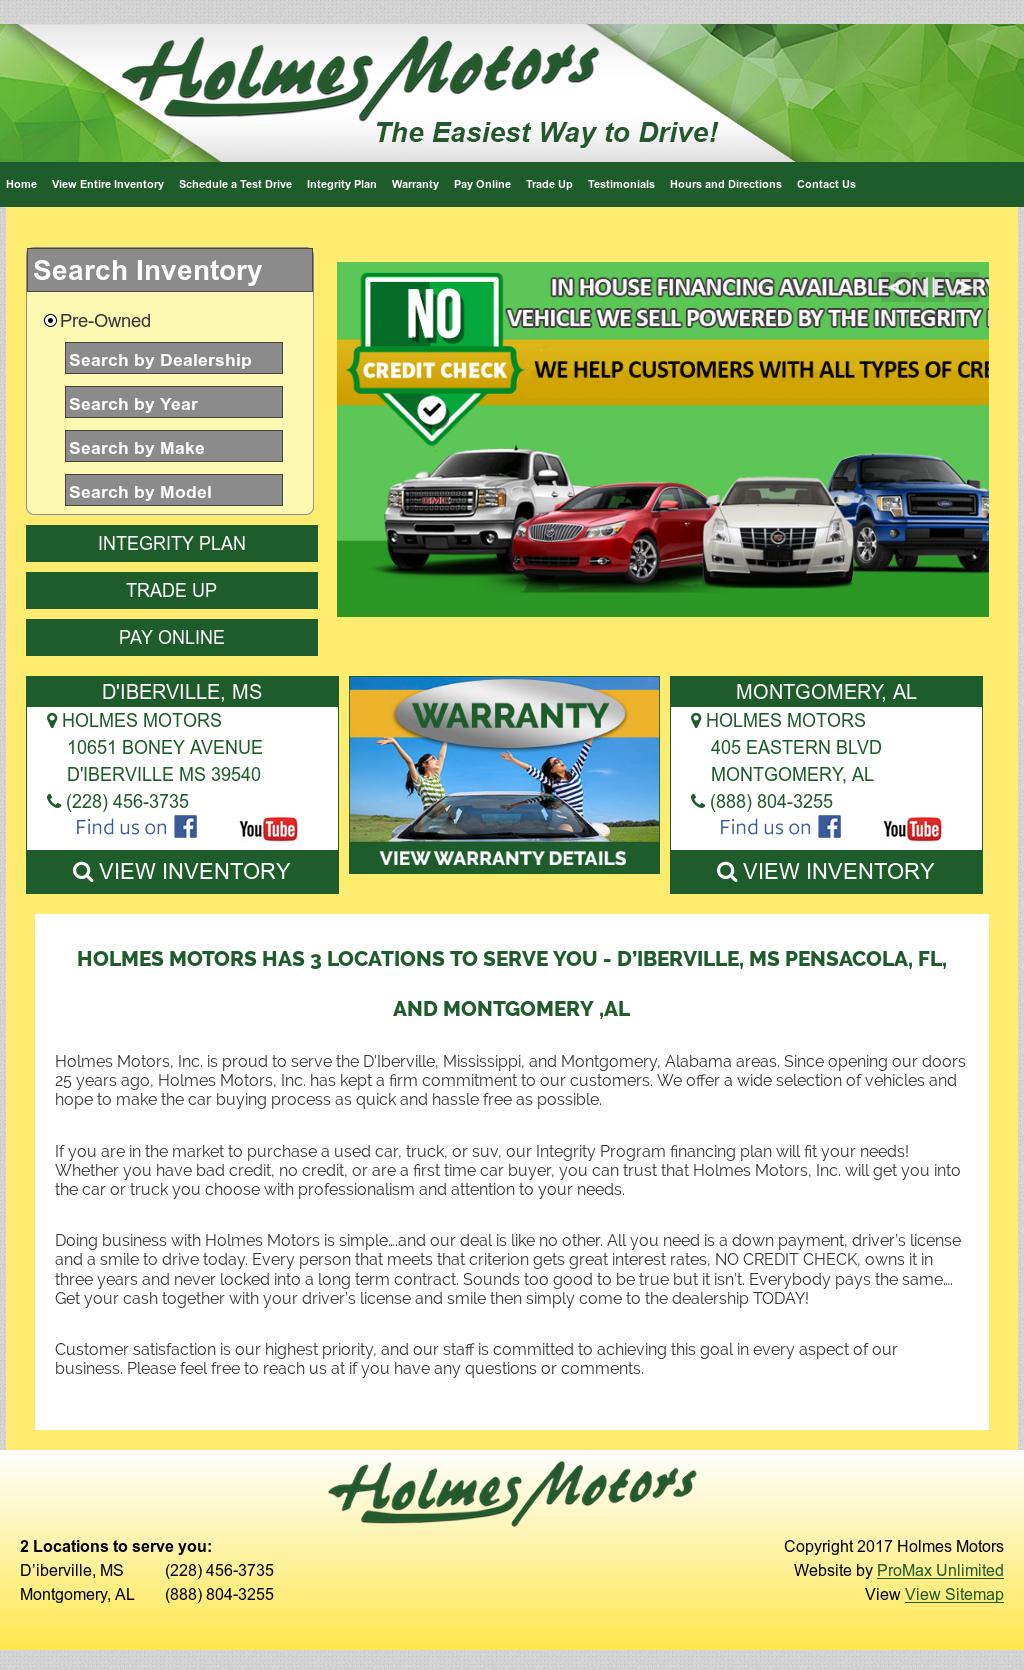 Holmes Motors Montgomery Al >> Holmesmotors Competitors Revenue And Employees Owler